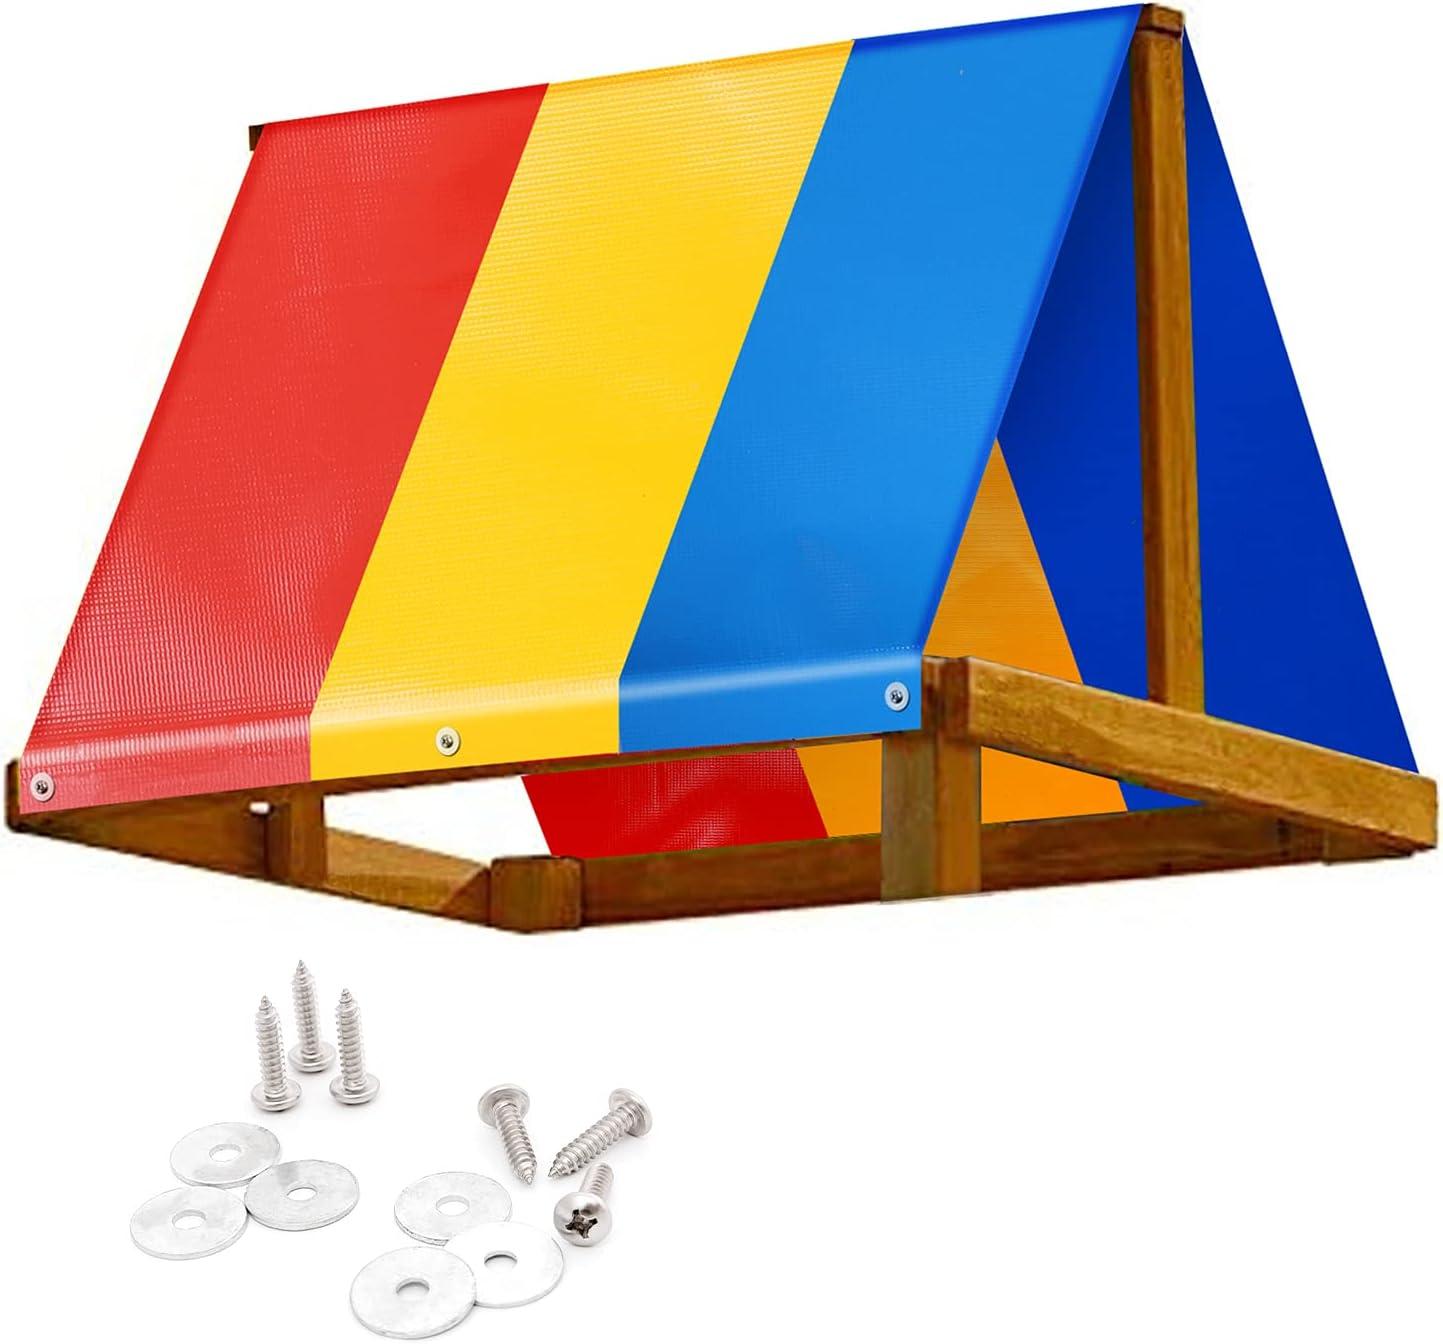 Yescom 52x90 Swing Set Canopy Replacement Waterproof Playground Tarp Cover Roof Playset Outdoor Child Swingset Shade